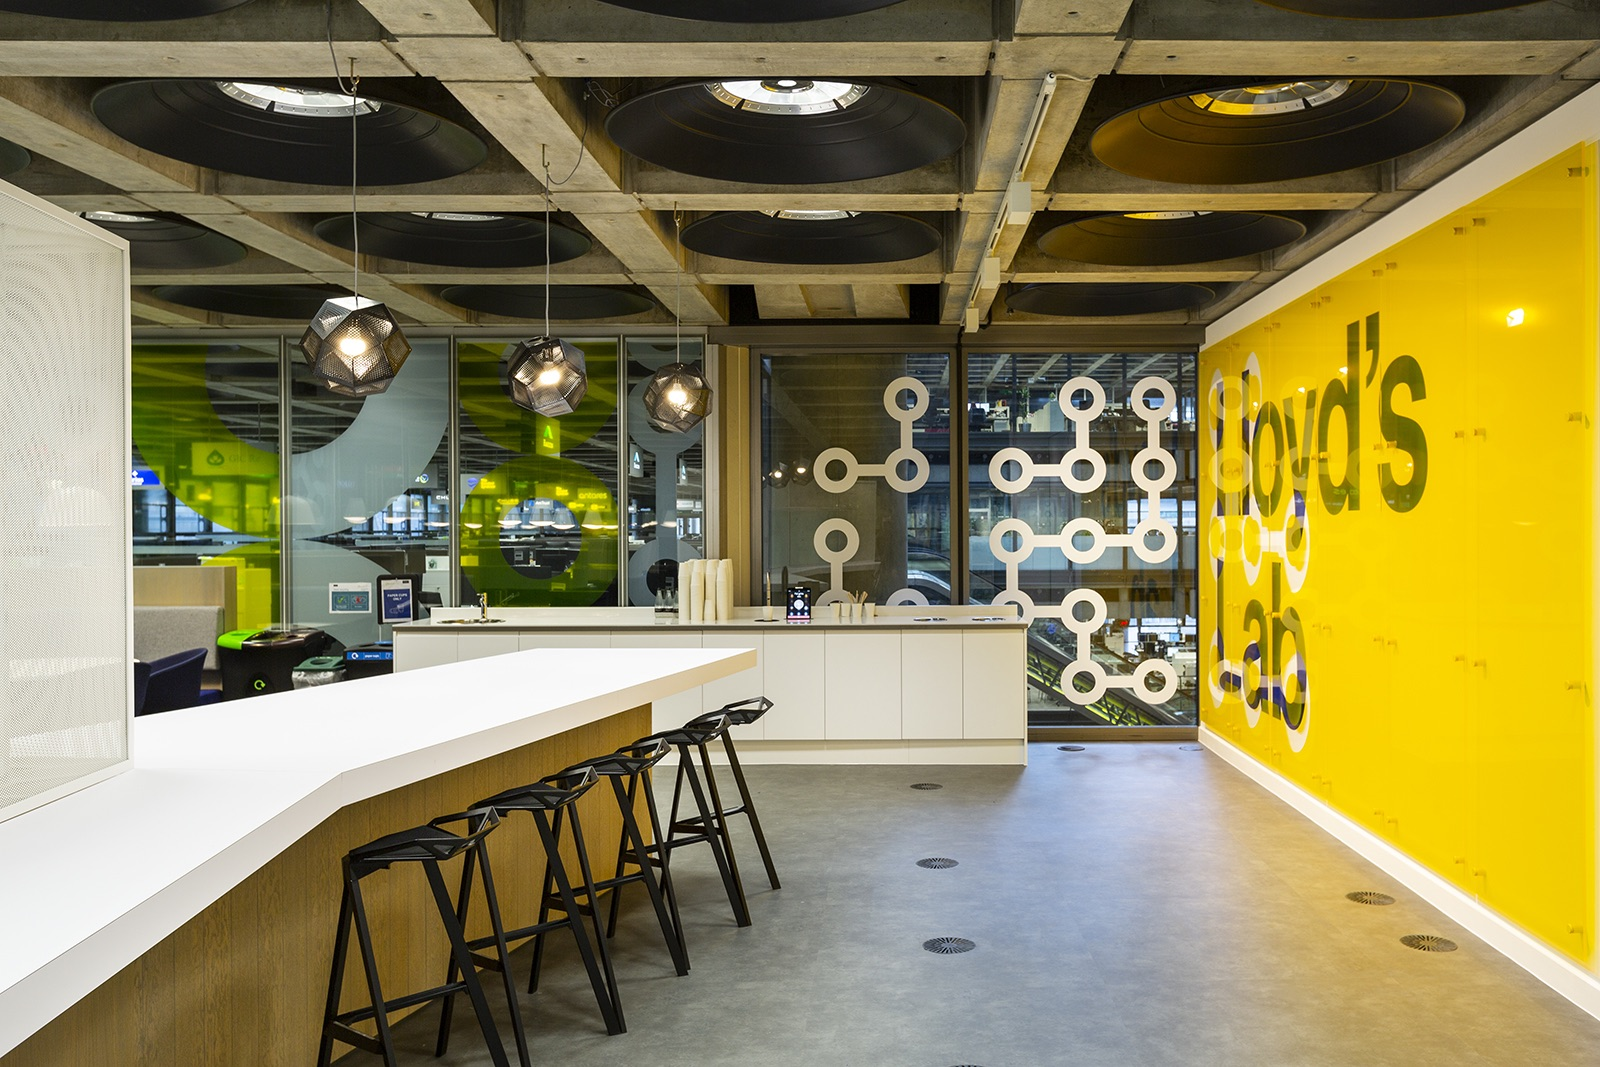 lloyds-office-london-11